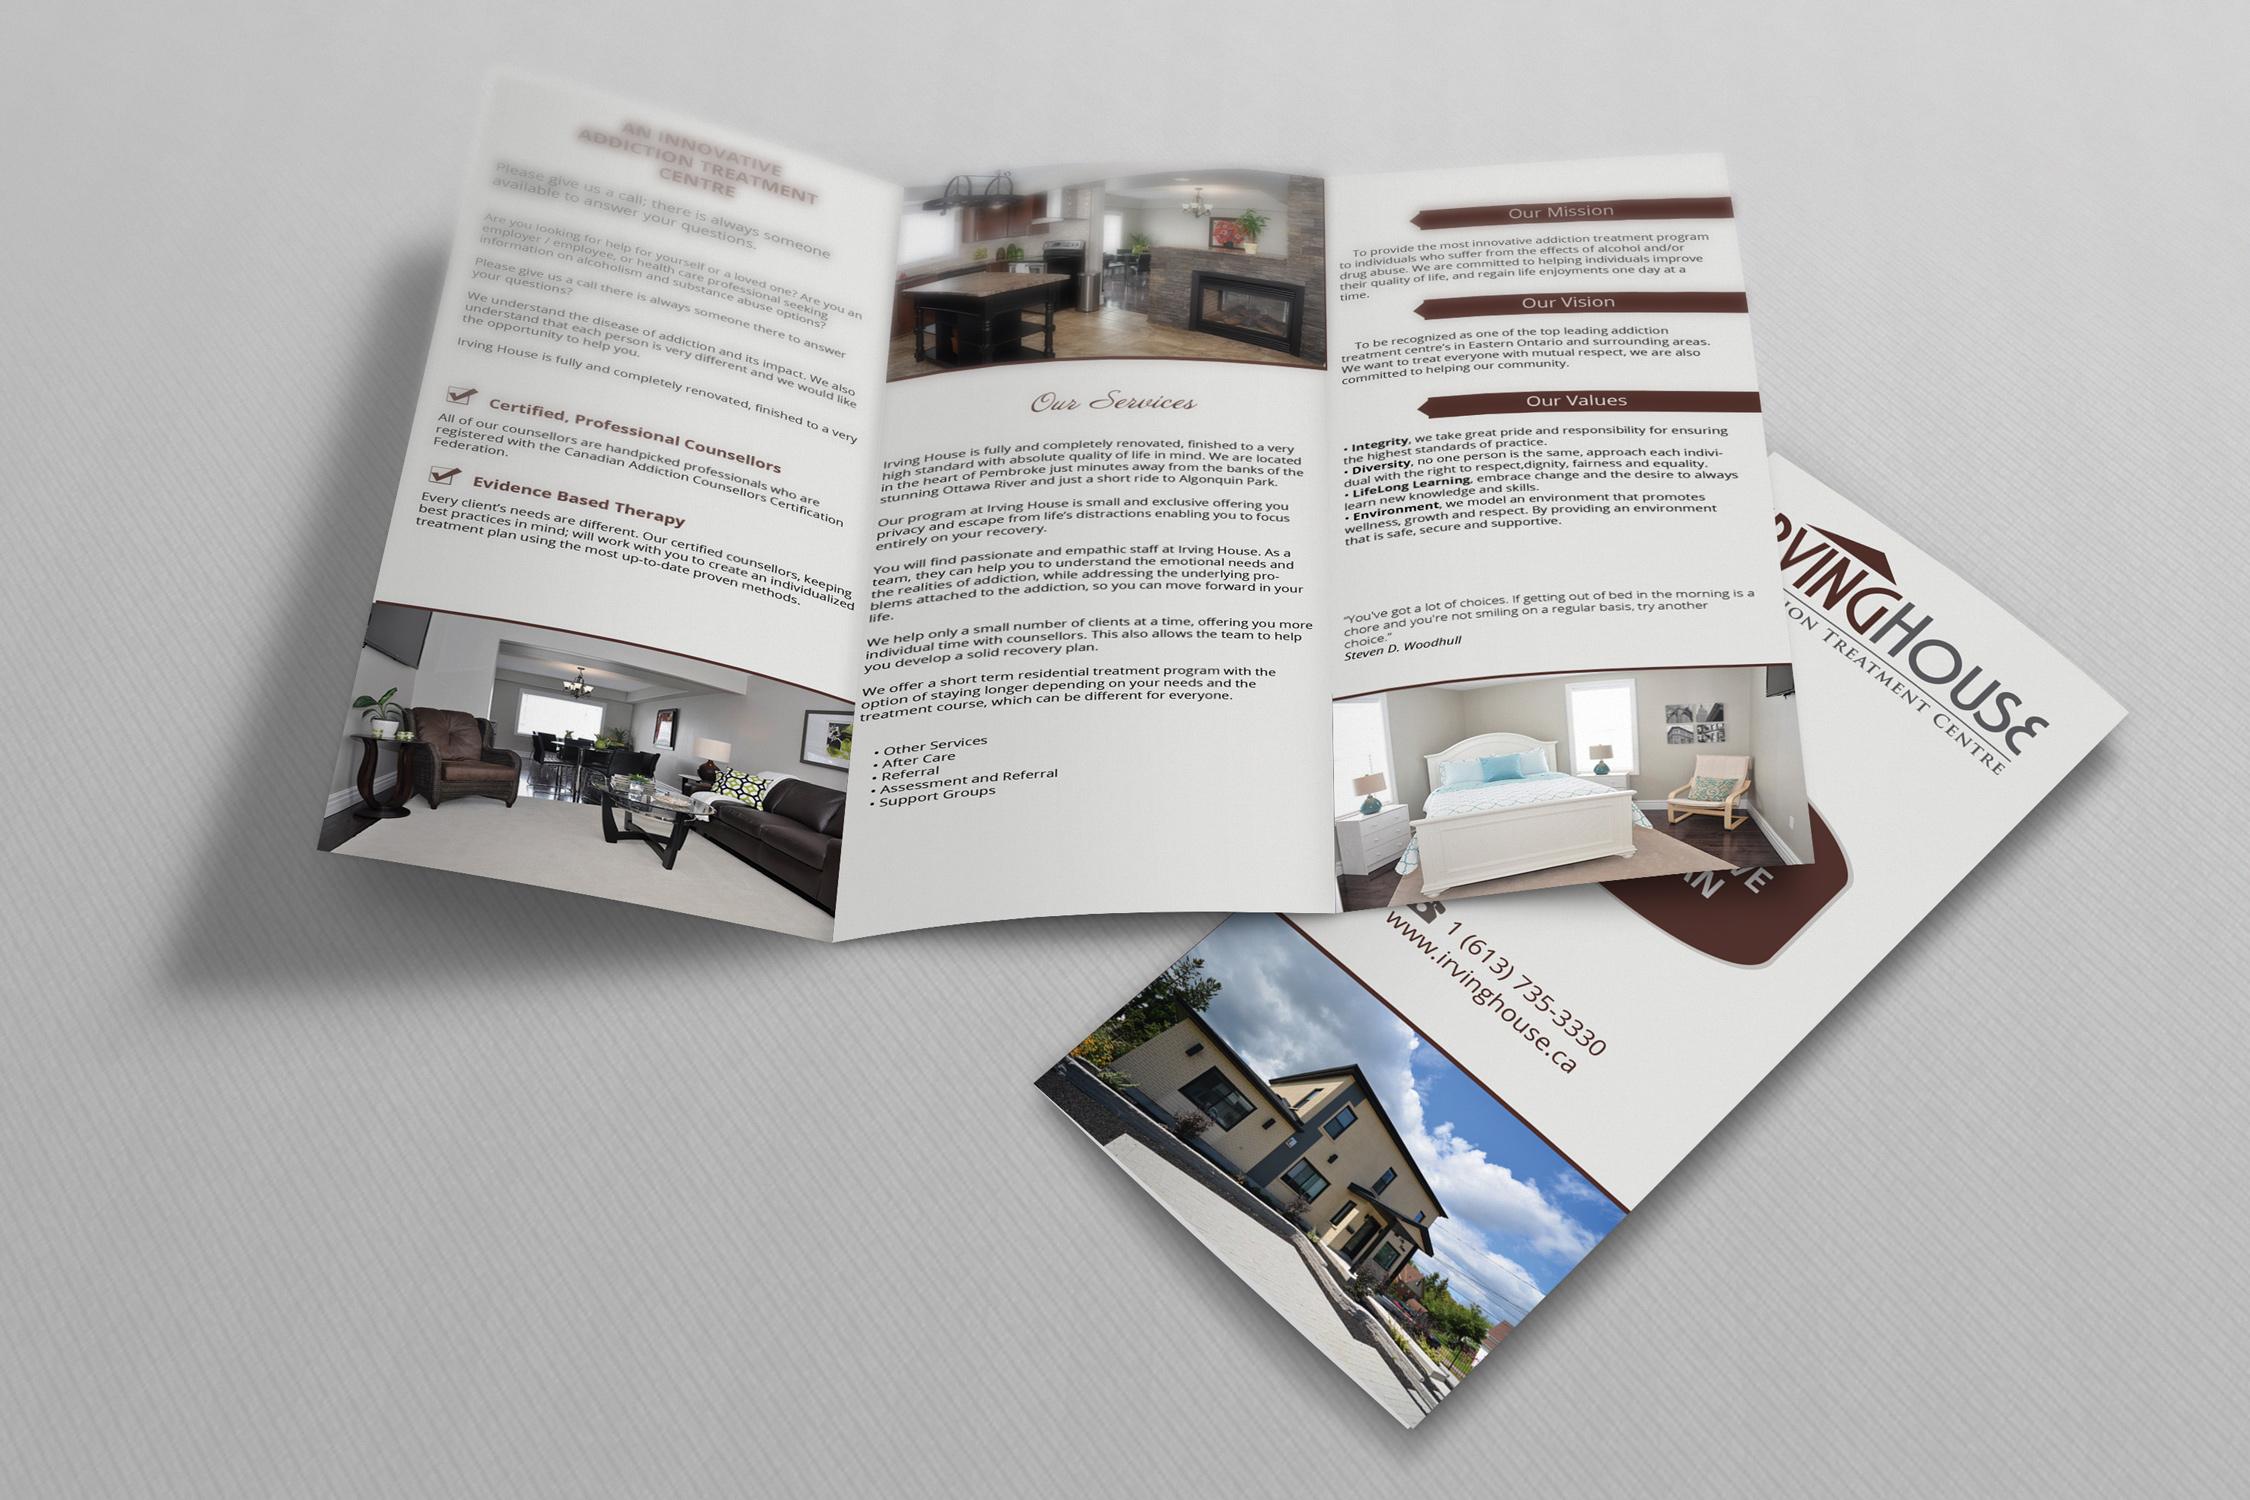 Brochure Irving House Addiction Treatment